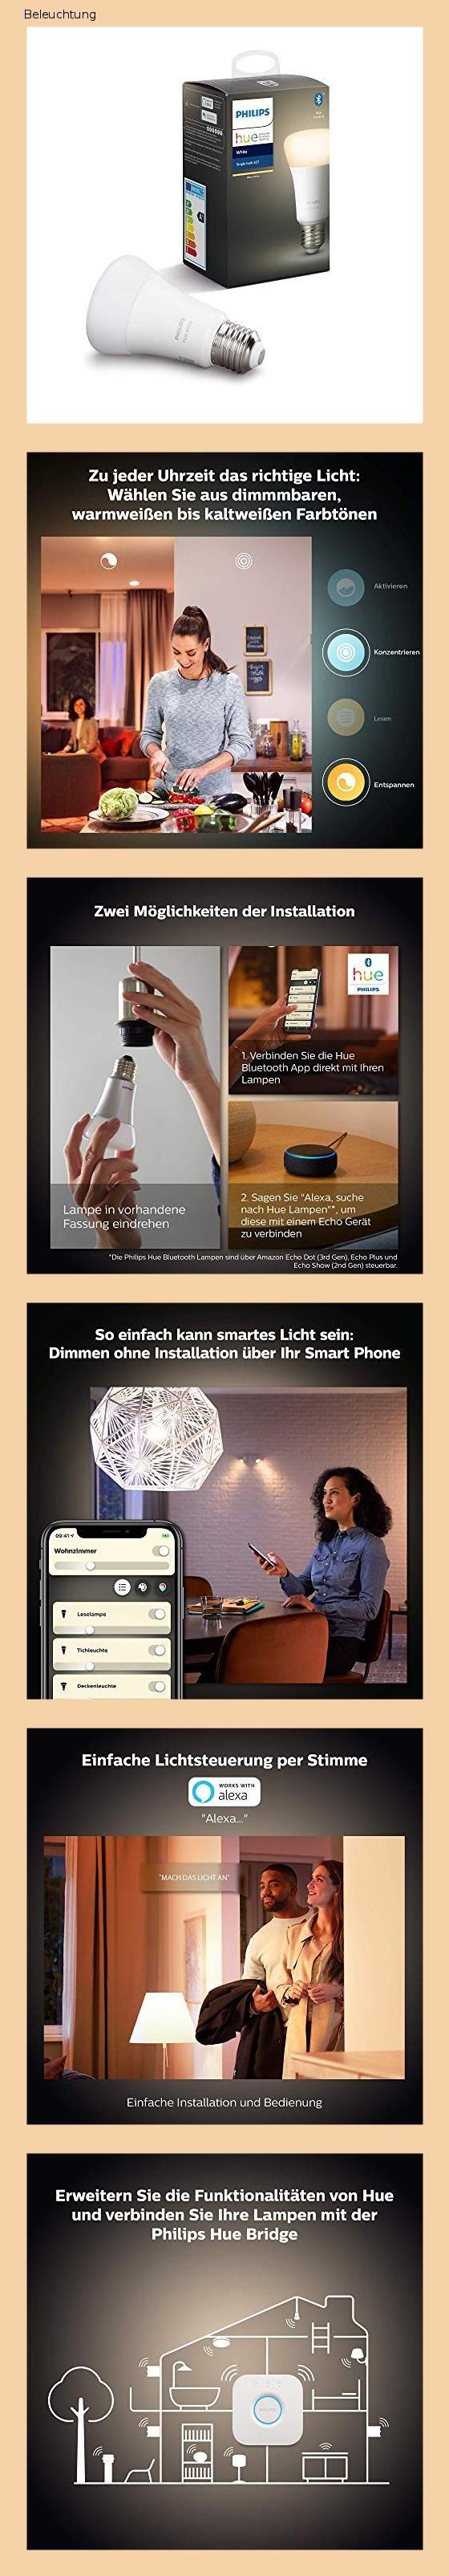 Philips Hue White E27 Led Lampe Einzelpack Dimmbar Warmweisses Licht Steuerbar Via App Kompati In 2020 Led Lampe Led Lampe